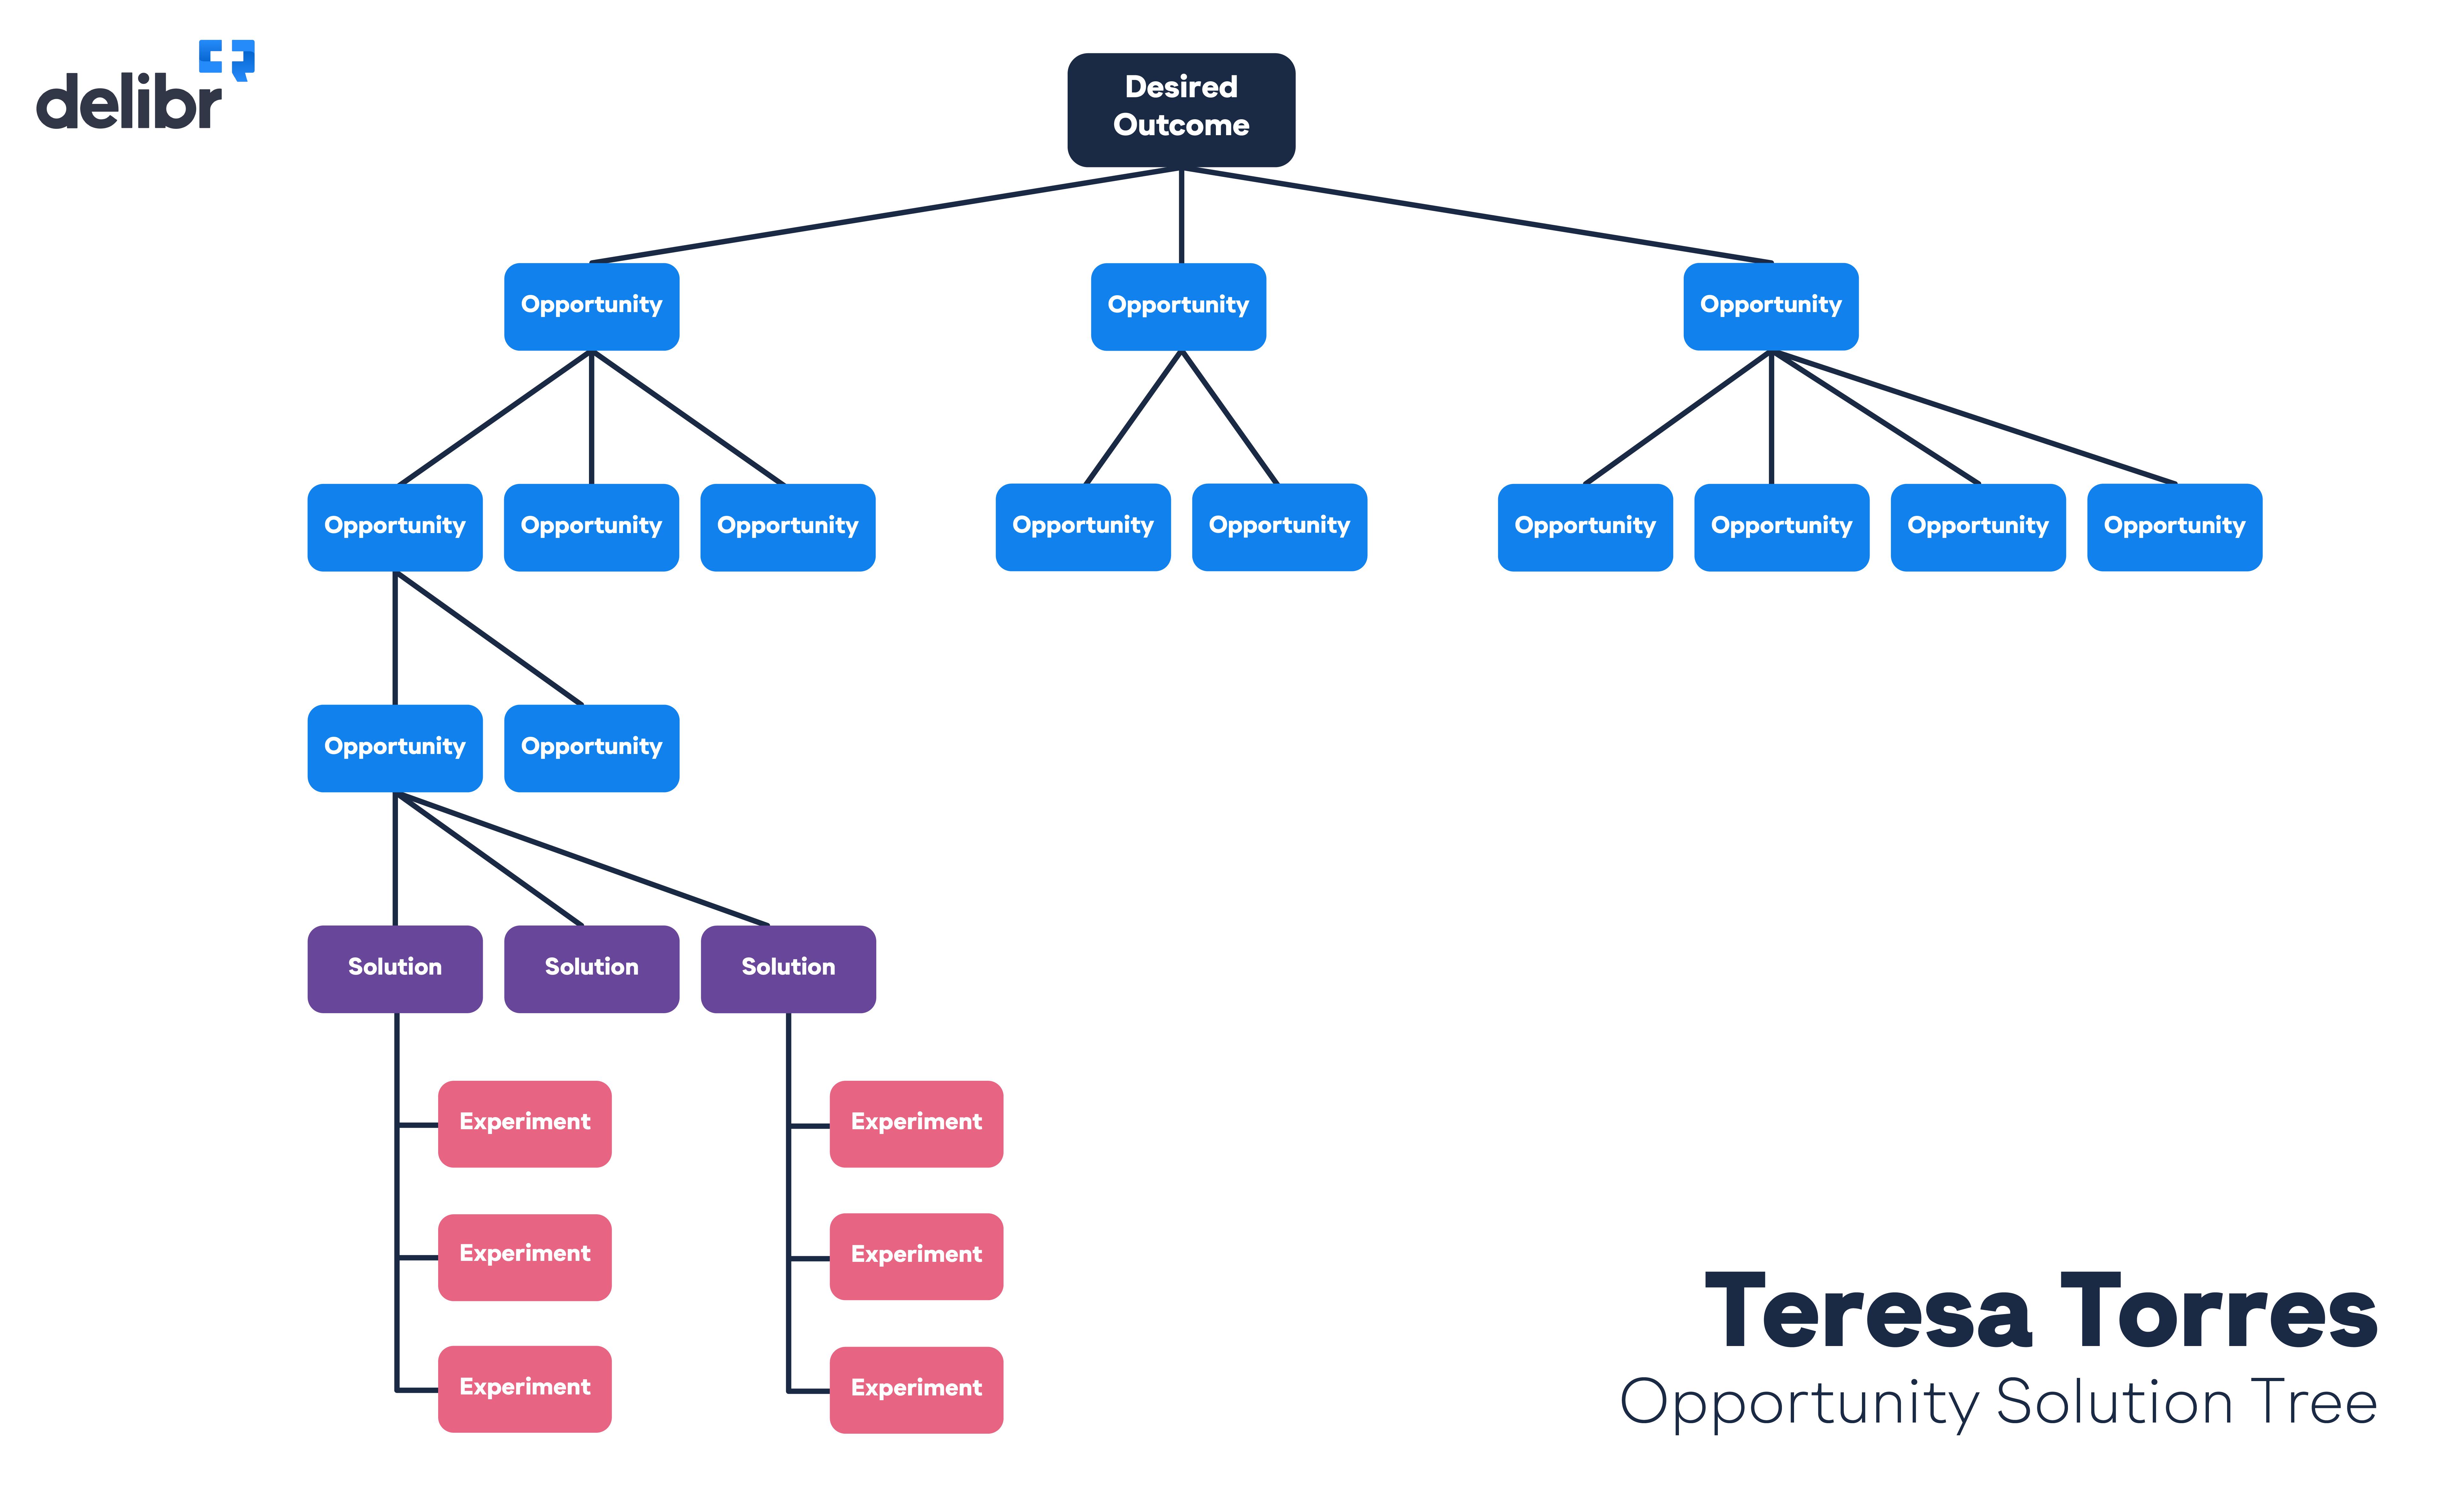 Teresa Torres solution tree